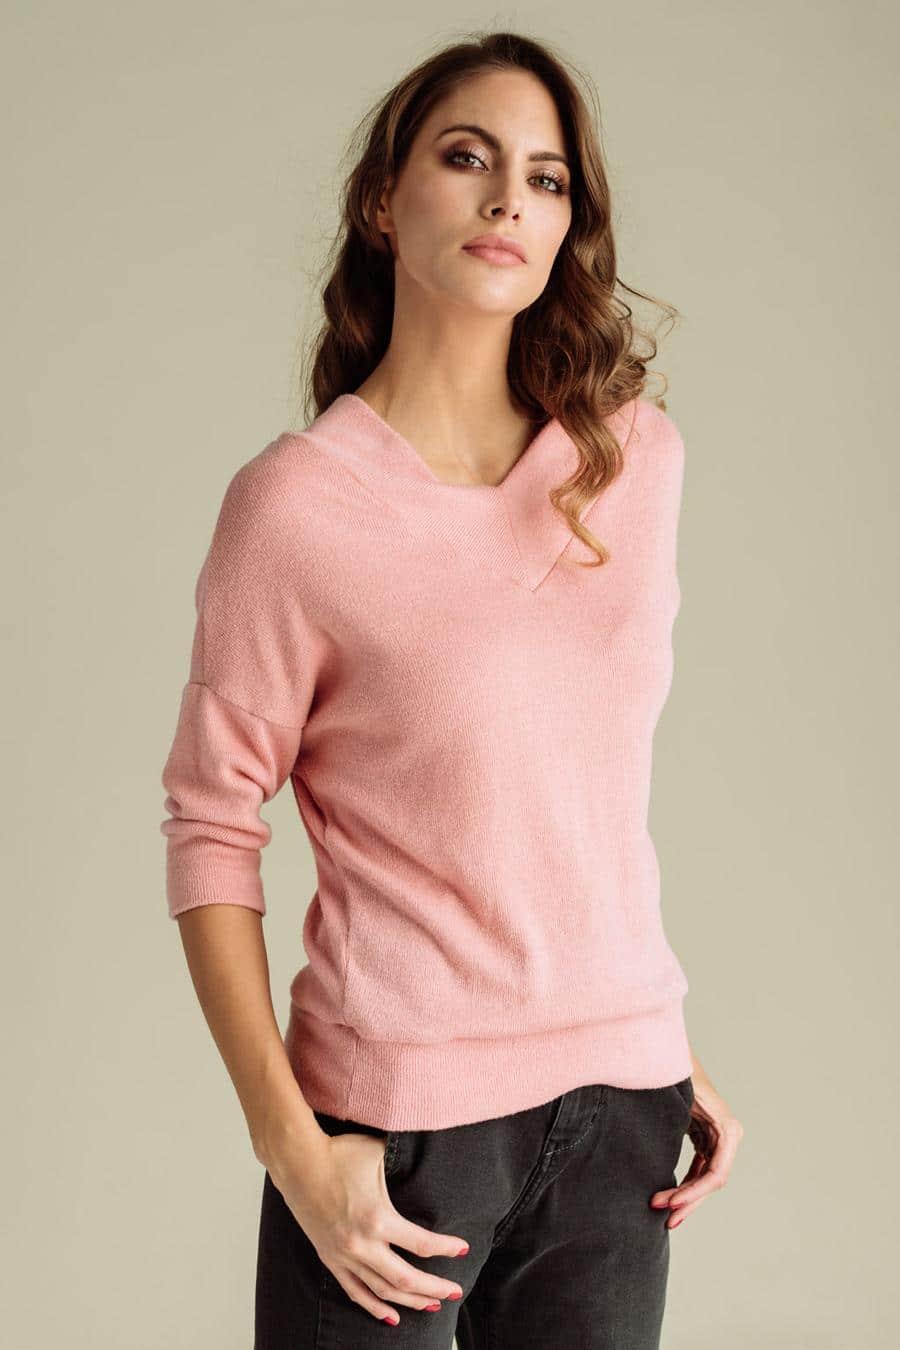 Jagger Zenska Bluza Kolekcija Prolece Leto Ss2021 Kupi Online Jg 9267 10 2 New